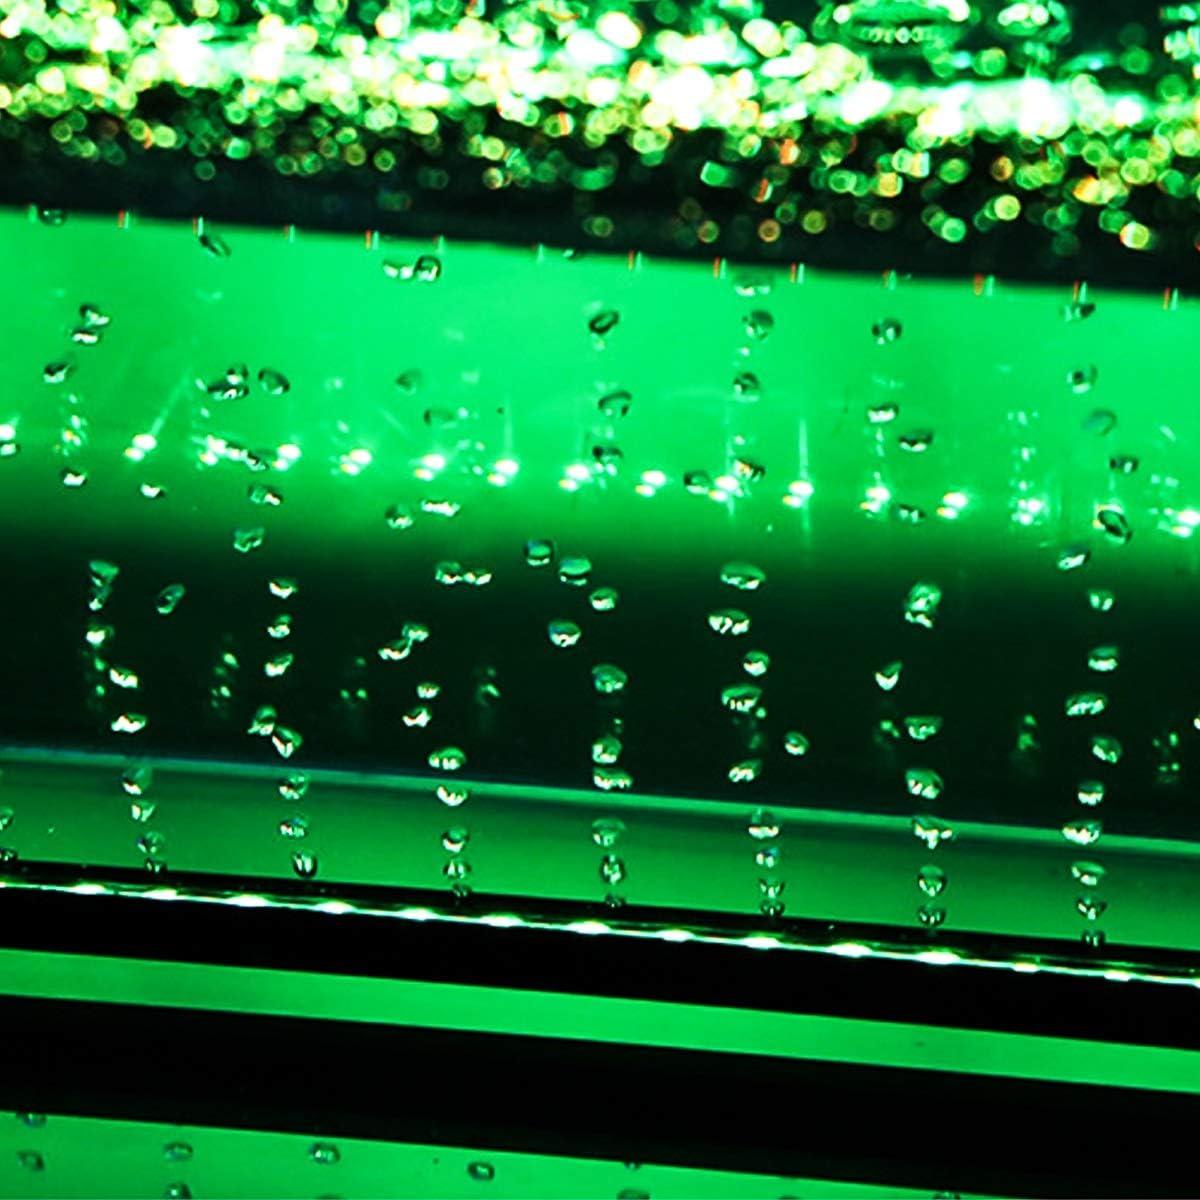 Wallfire 16 Colores Control Remoto 5050 RGB Impermeable Burbuja de Aire L/ámpara LED Acuario Fish Tank Light Luz Sumergible Size : 16cm - 9LED